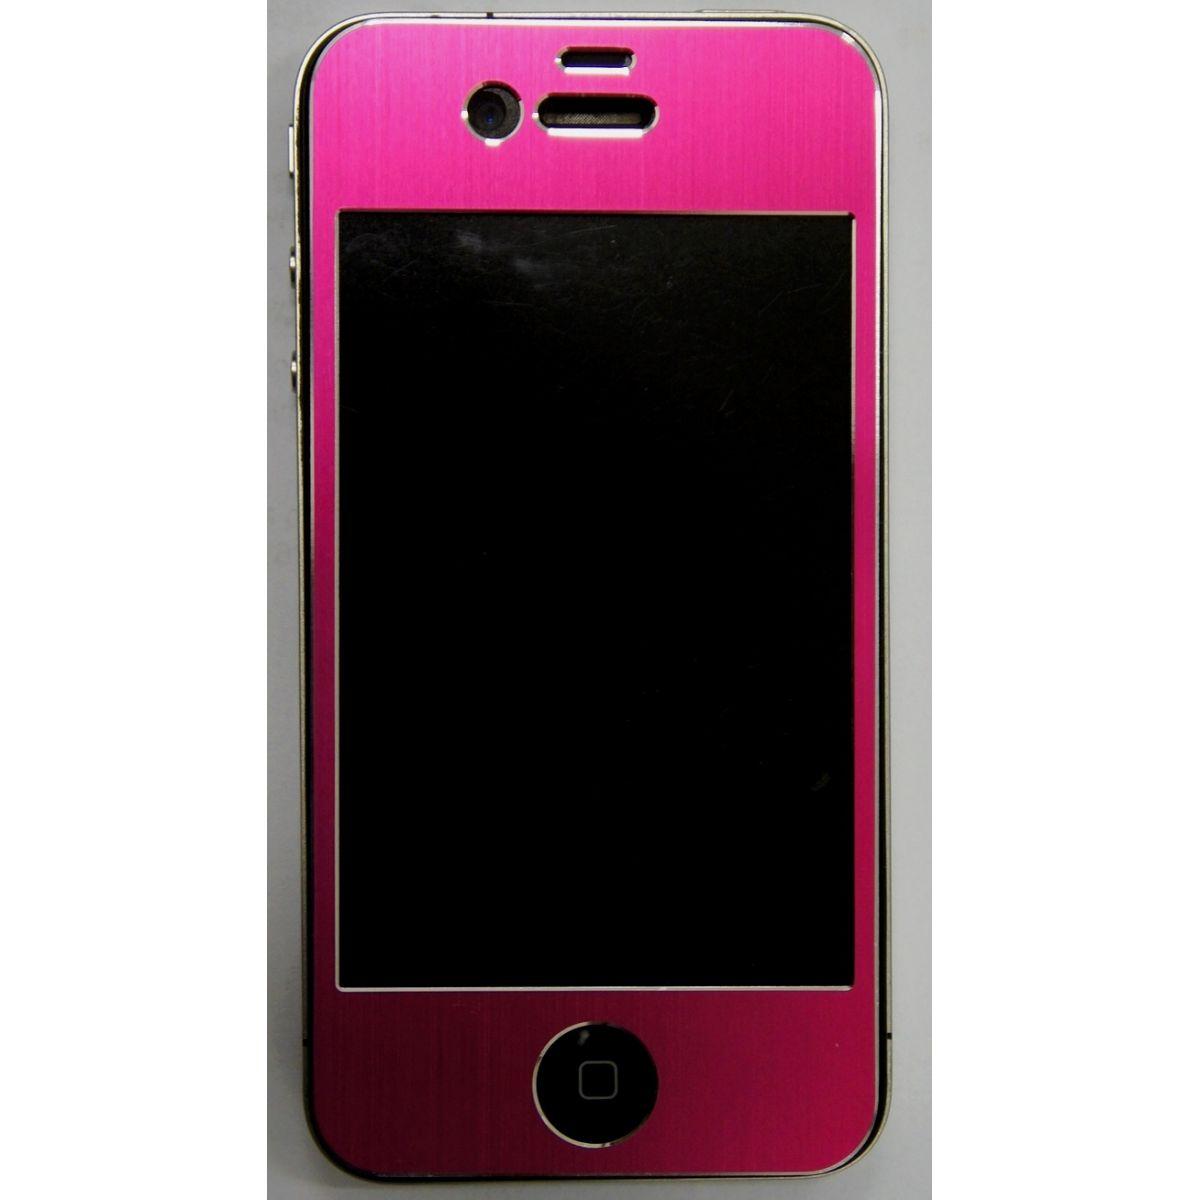 PACK Compre 7 Capas Pague 3 - Capa iphone 4 / 4S Skin Rosa